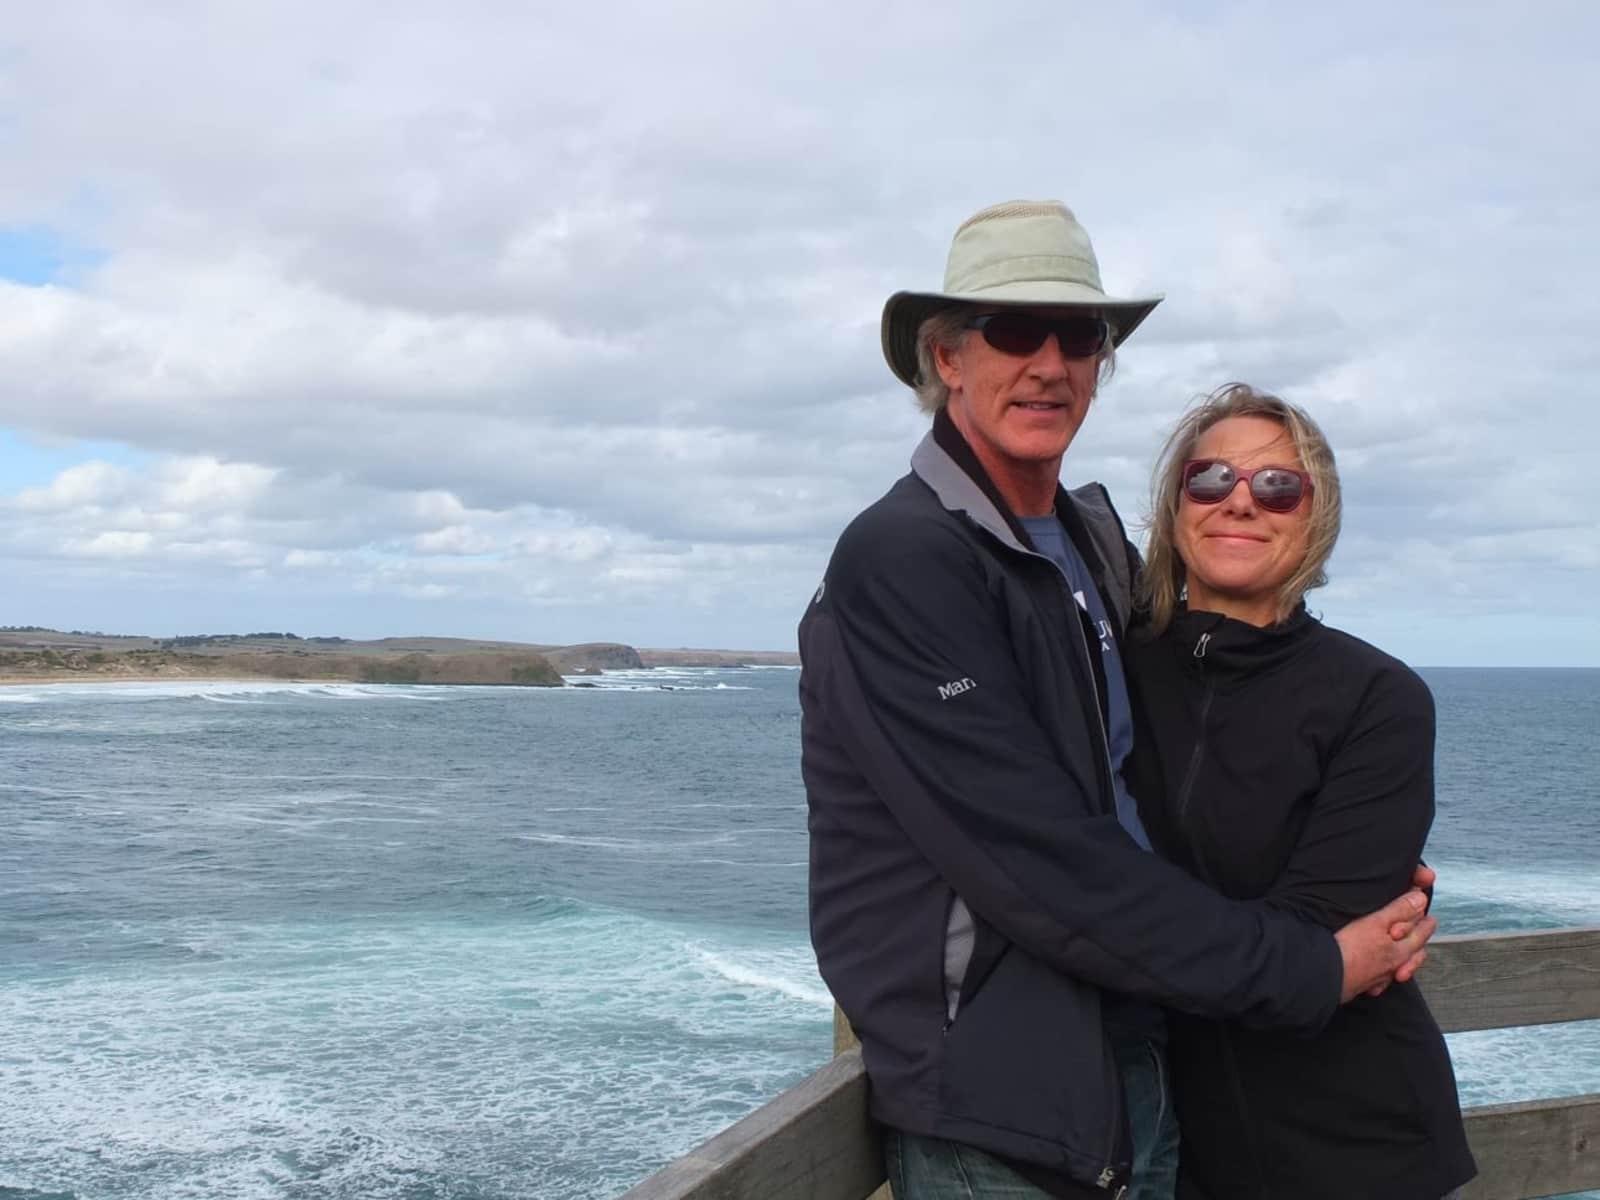 Linda & Gordon from Palm Harbor, Florida, United States